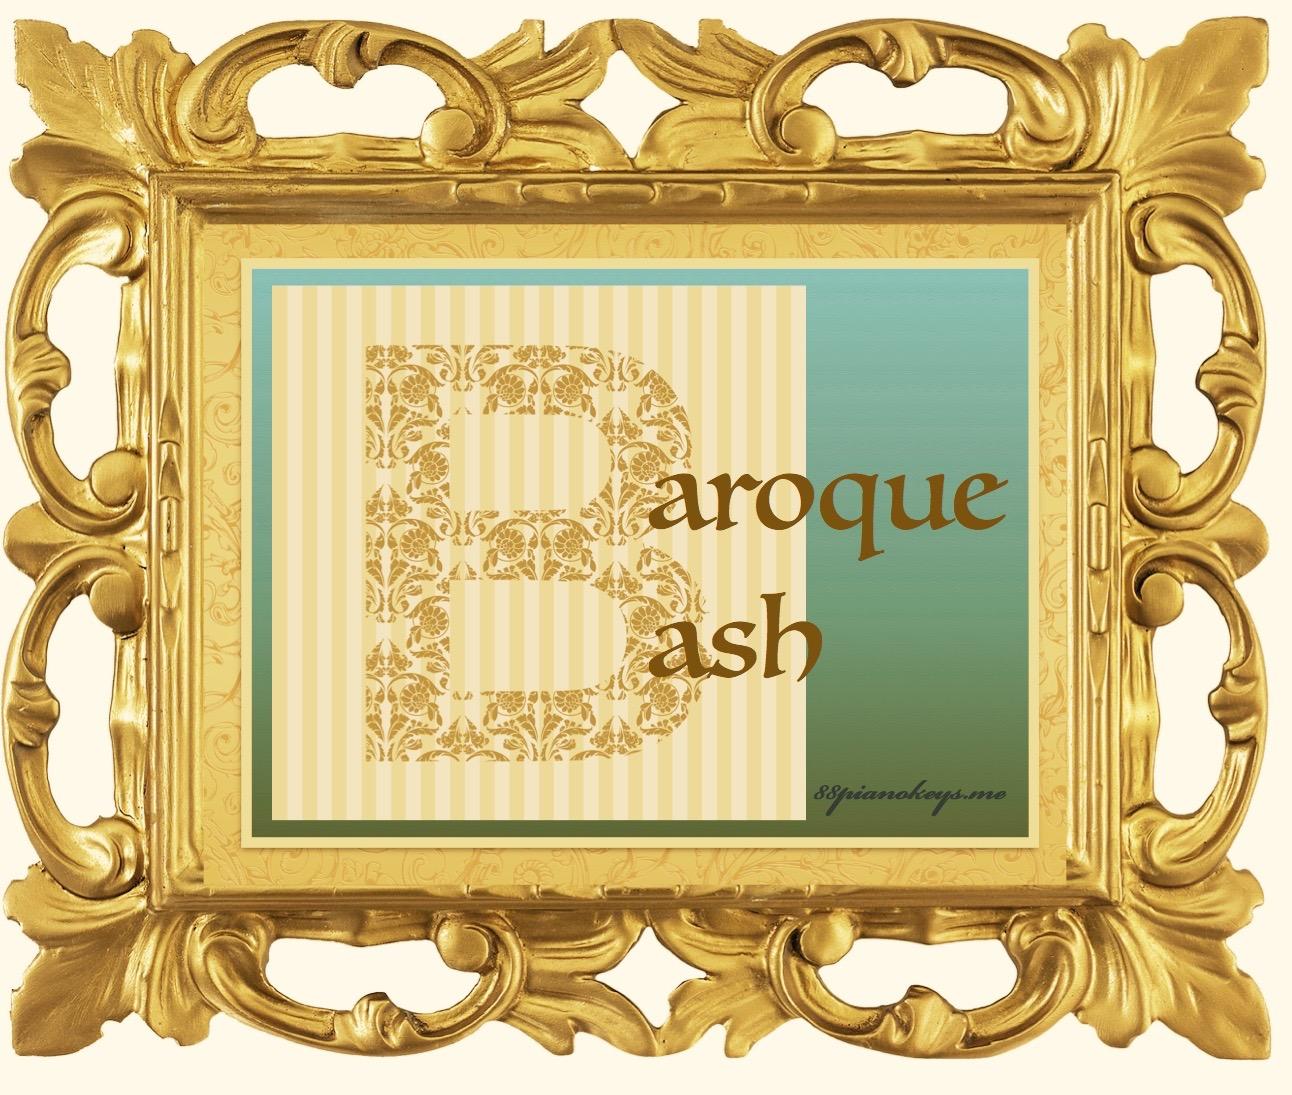 Baroque-Bash-2-1.jpg